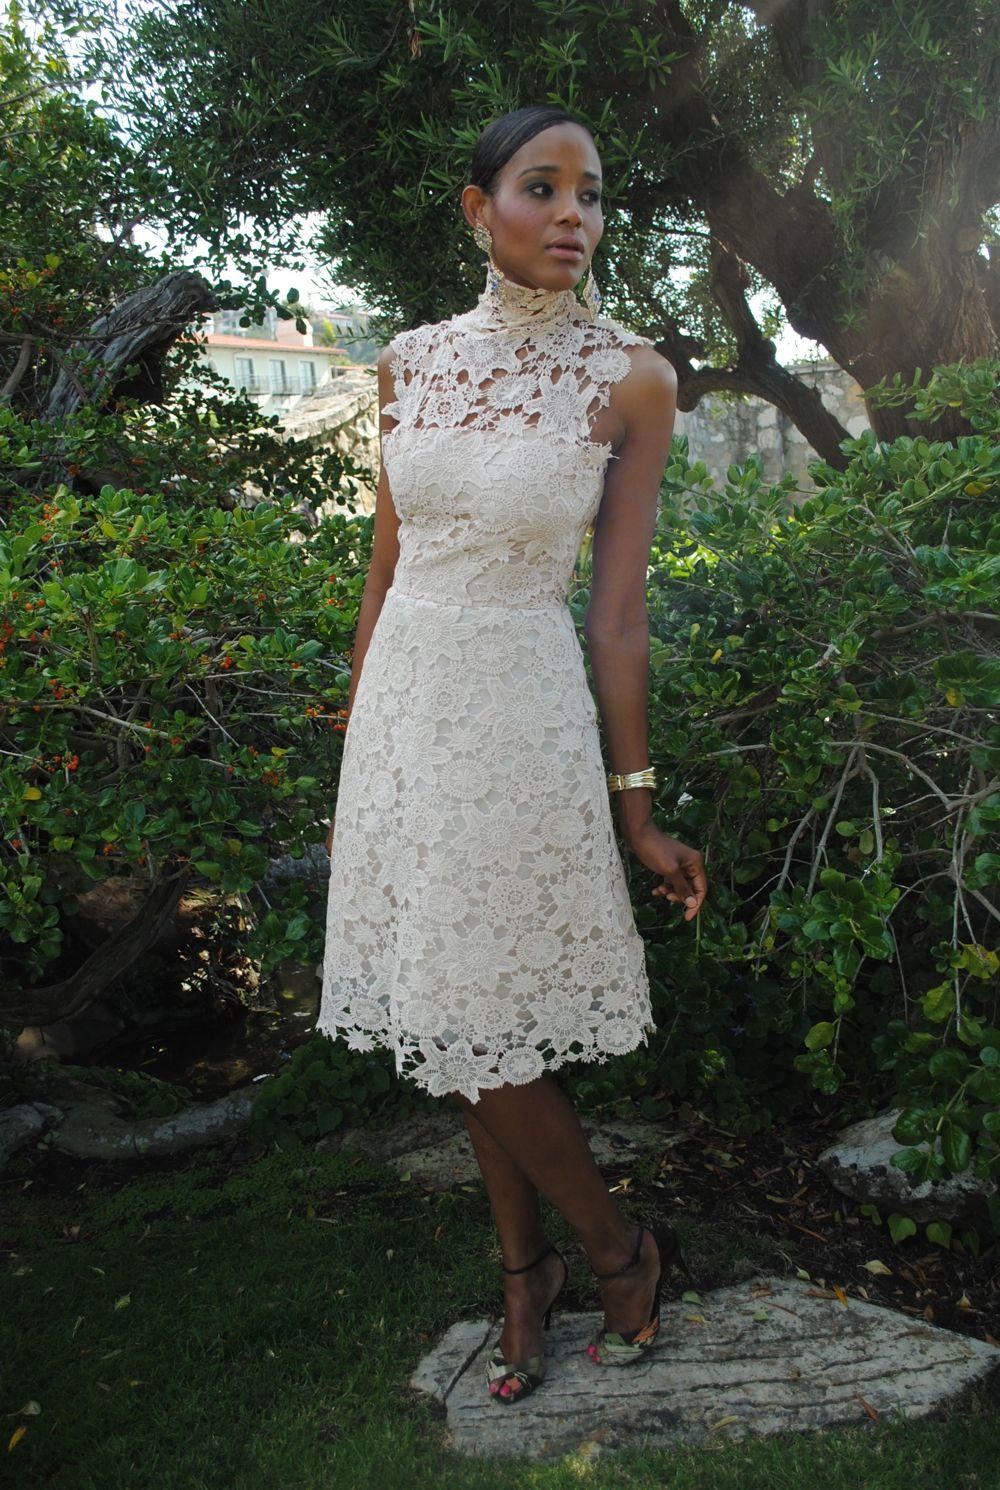 Jolie Lace Dress Tea length dresses, Tea length wedding